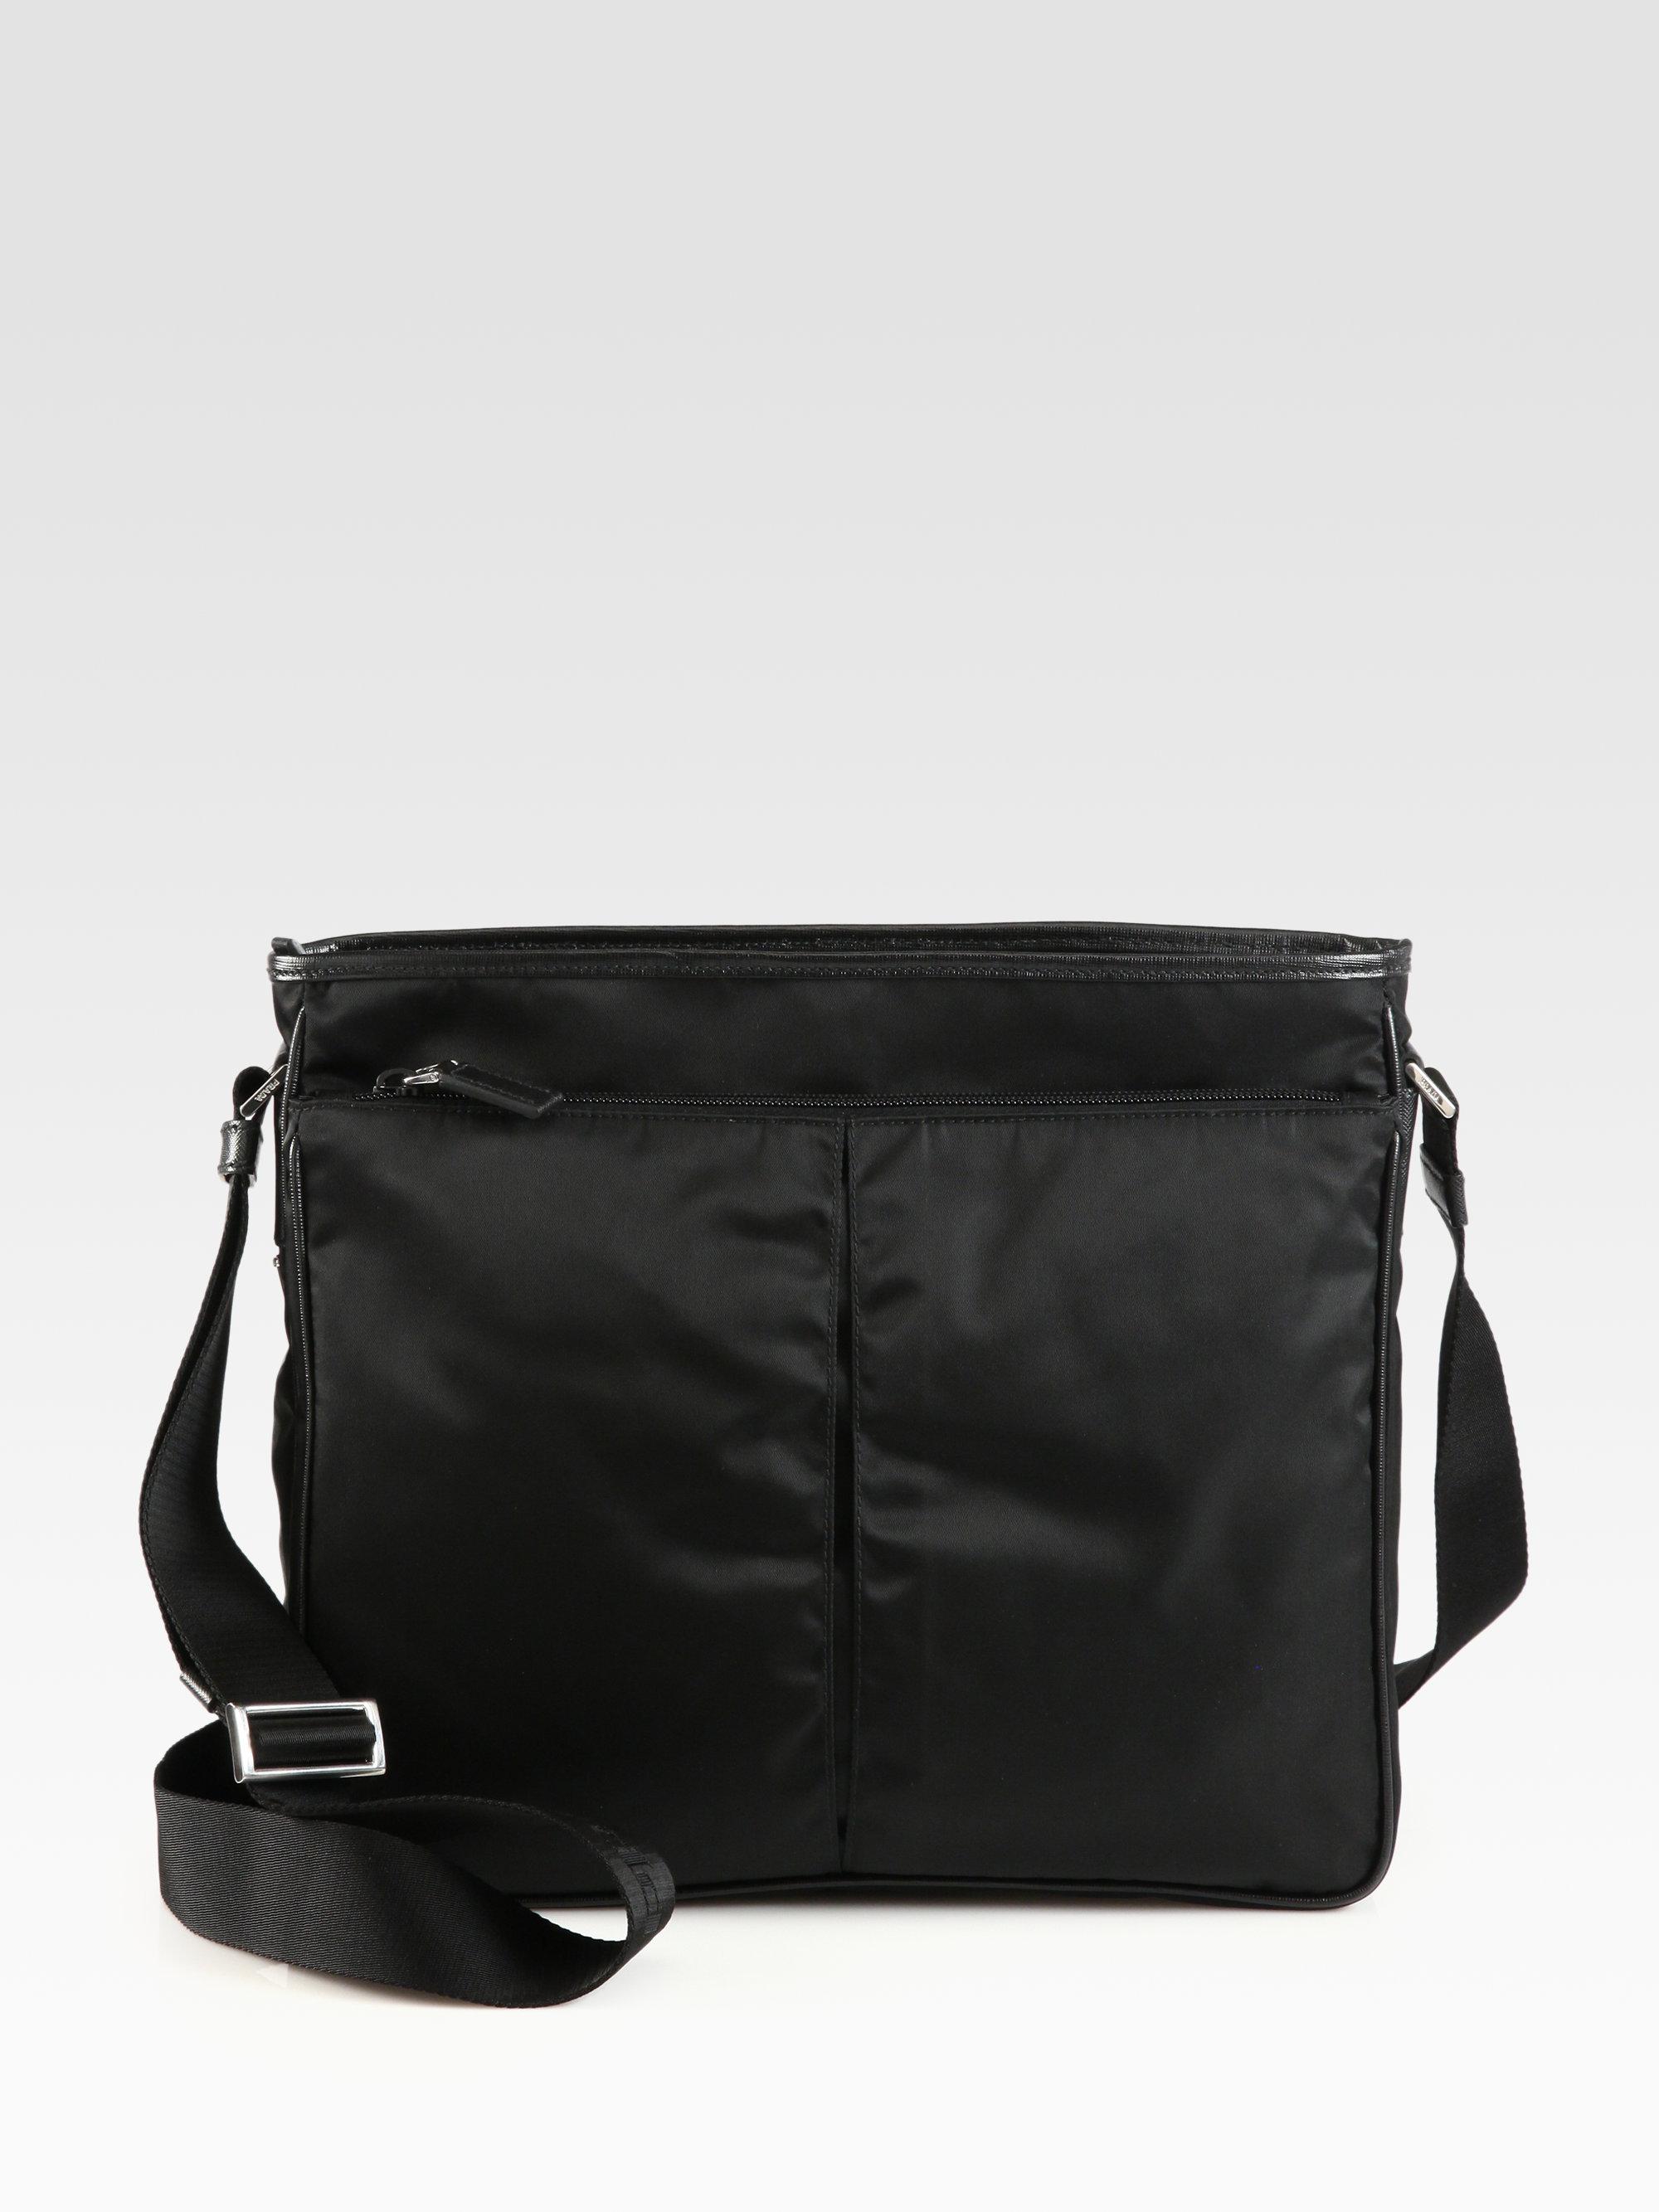 Prada Nylon Large Crossbody Bag In Black For Men Lyst